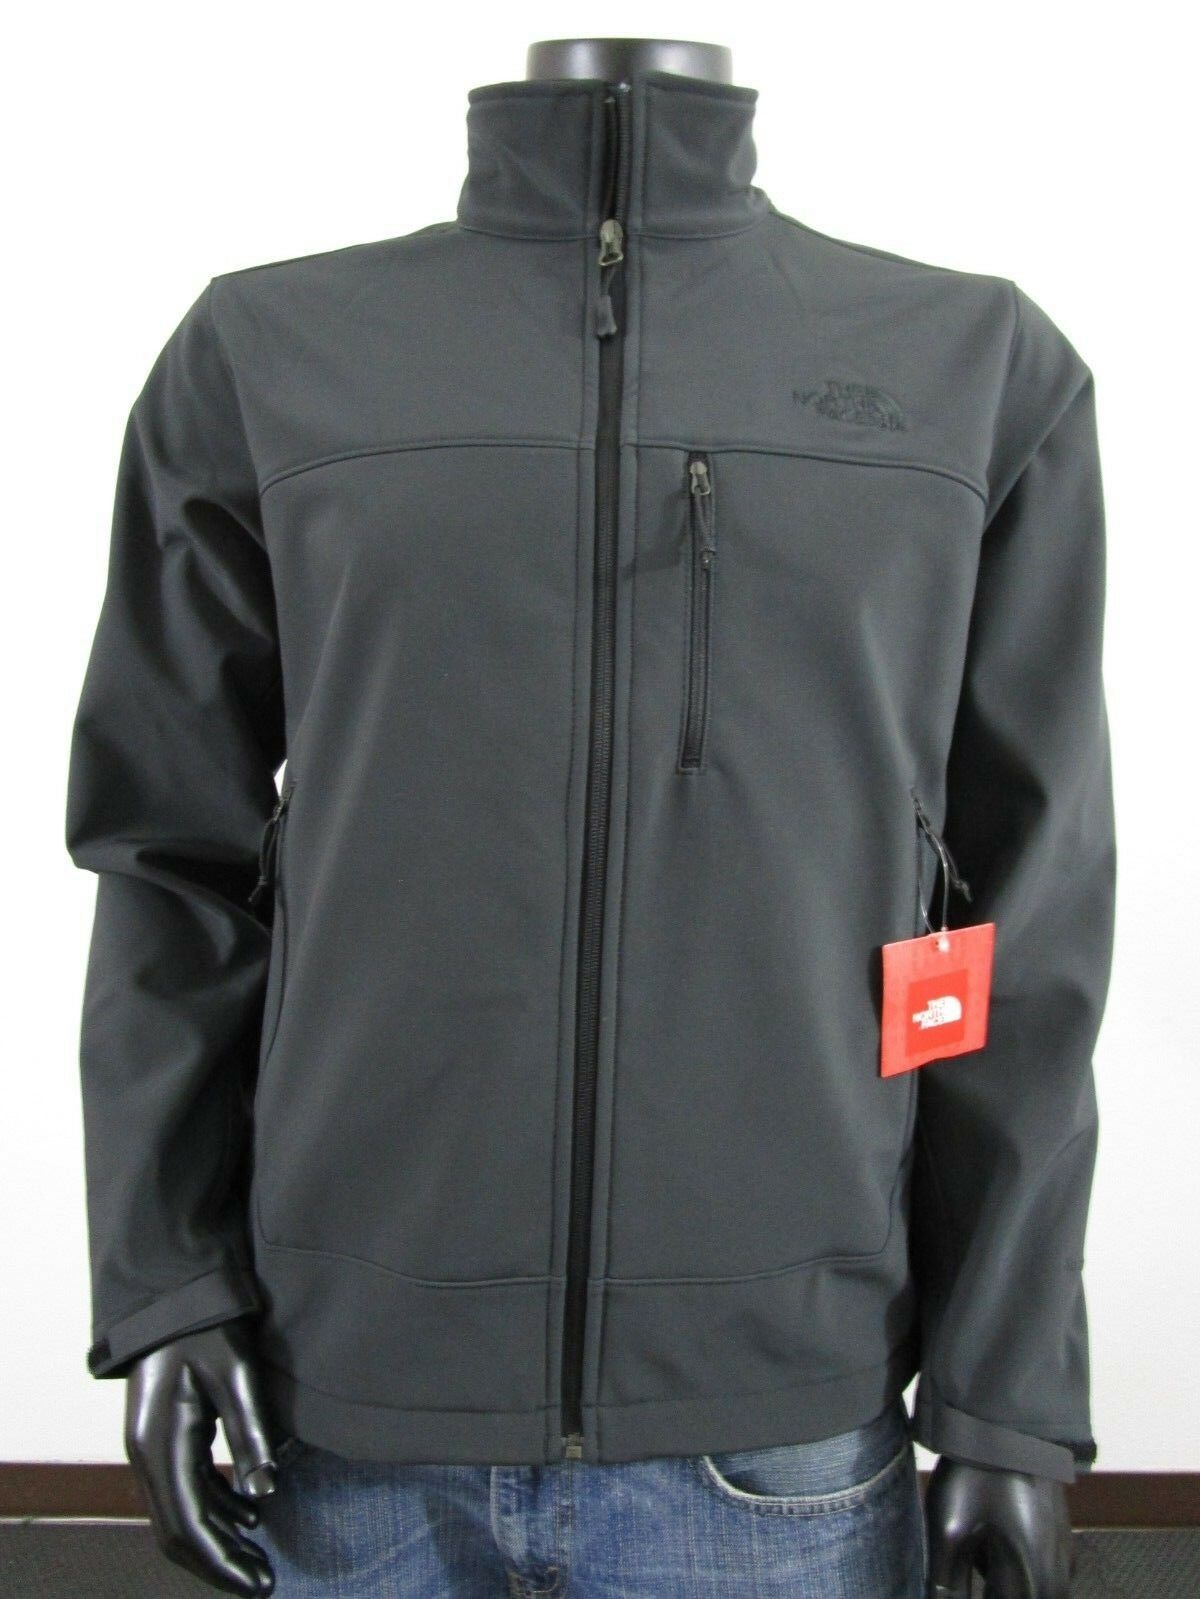 68331b1667e The North Face Men s Size Medium Apex Bionic Softshell Jacket TNF ...